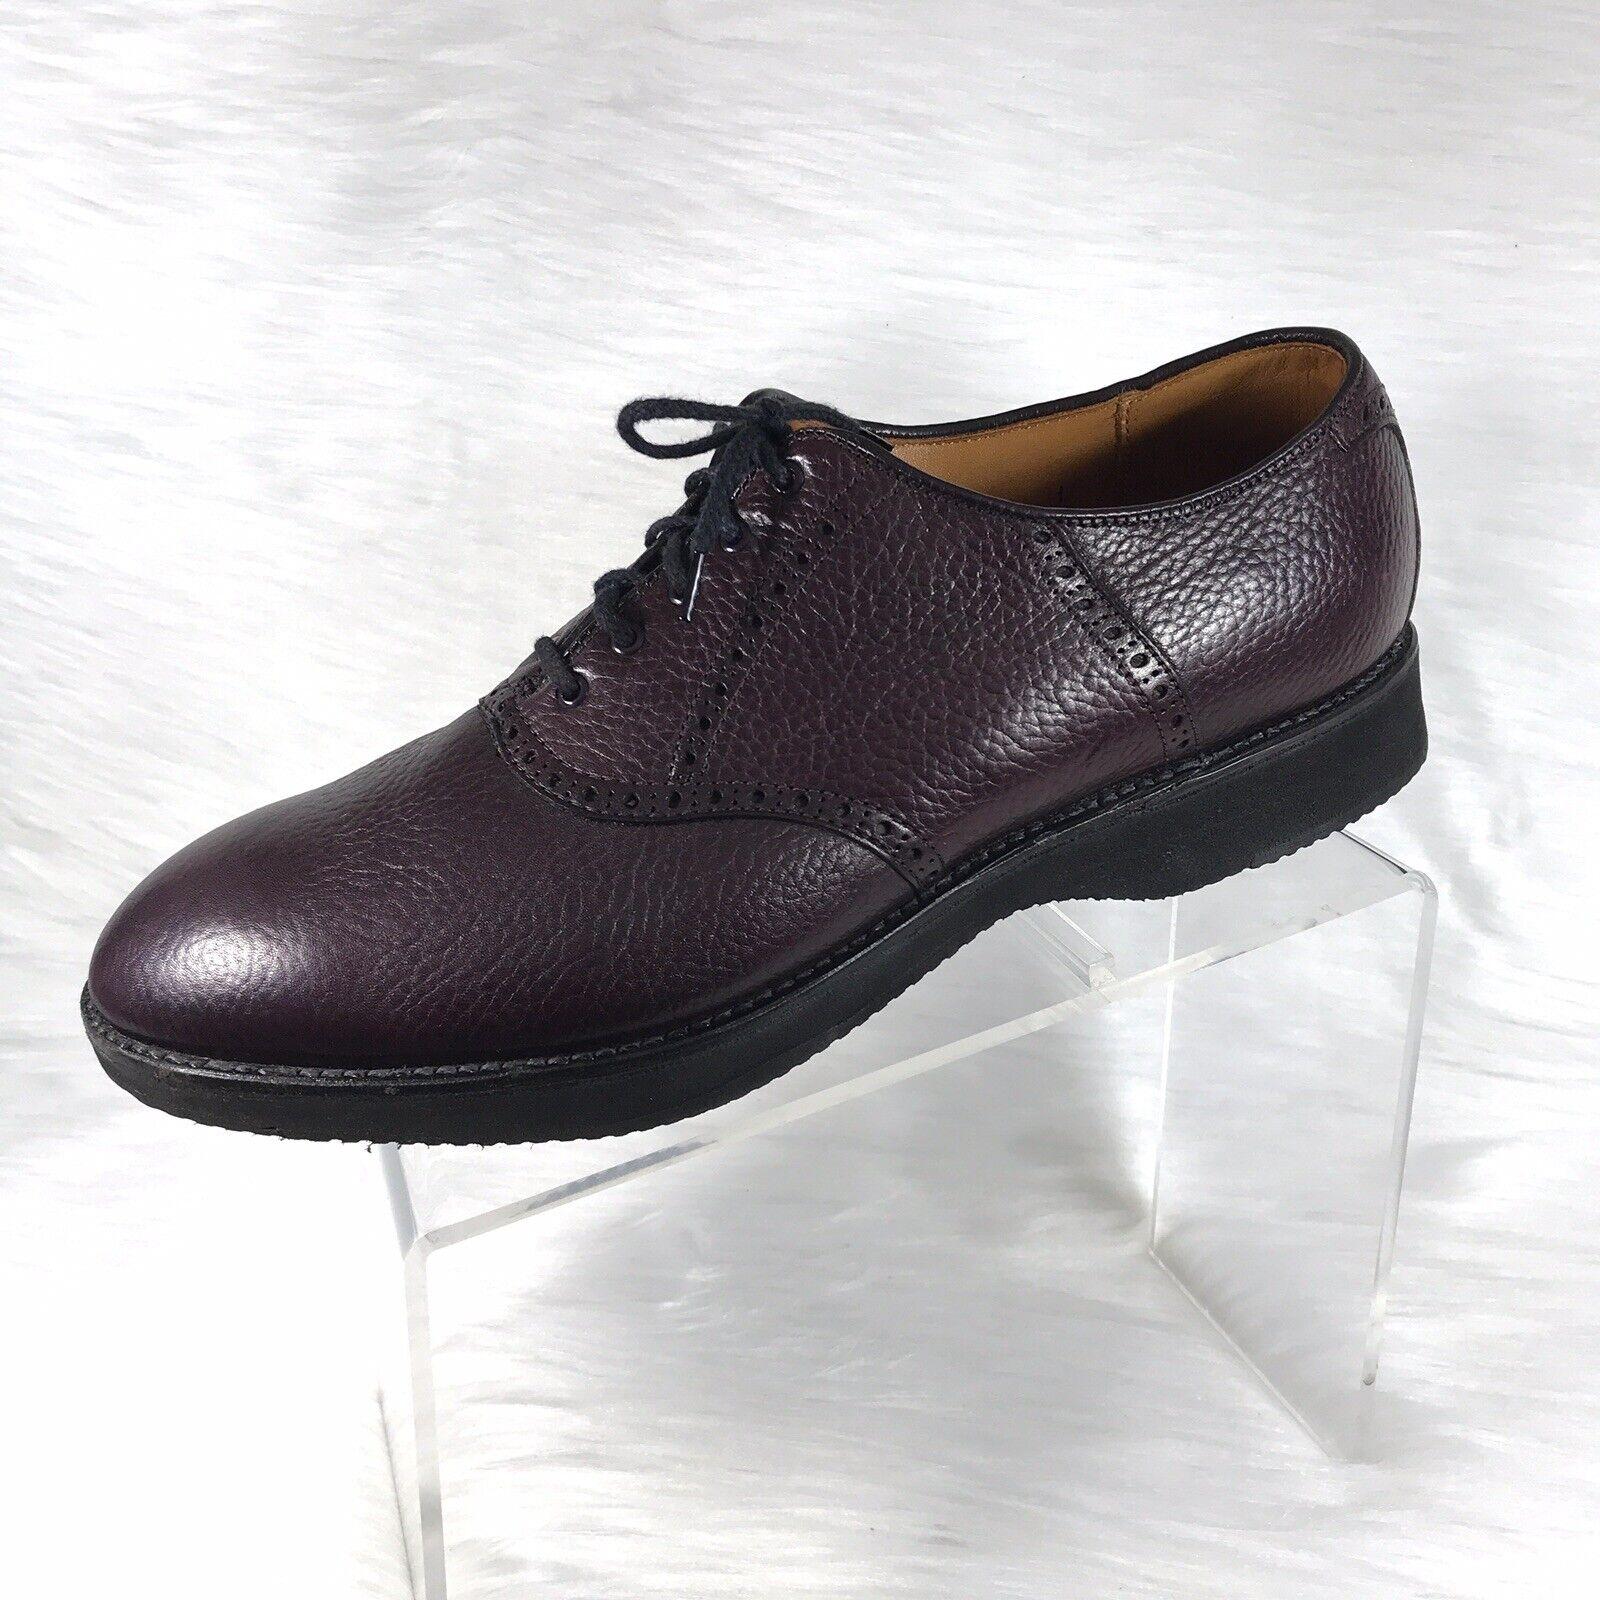 Alden Men's Oxfords Pebbled Burgundy Leather Size 11.5 A C USA Goodyear Welt